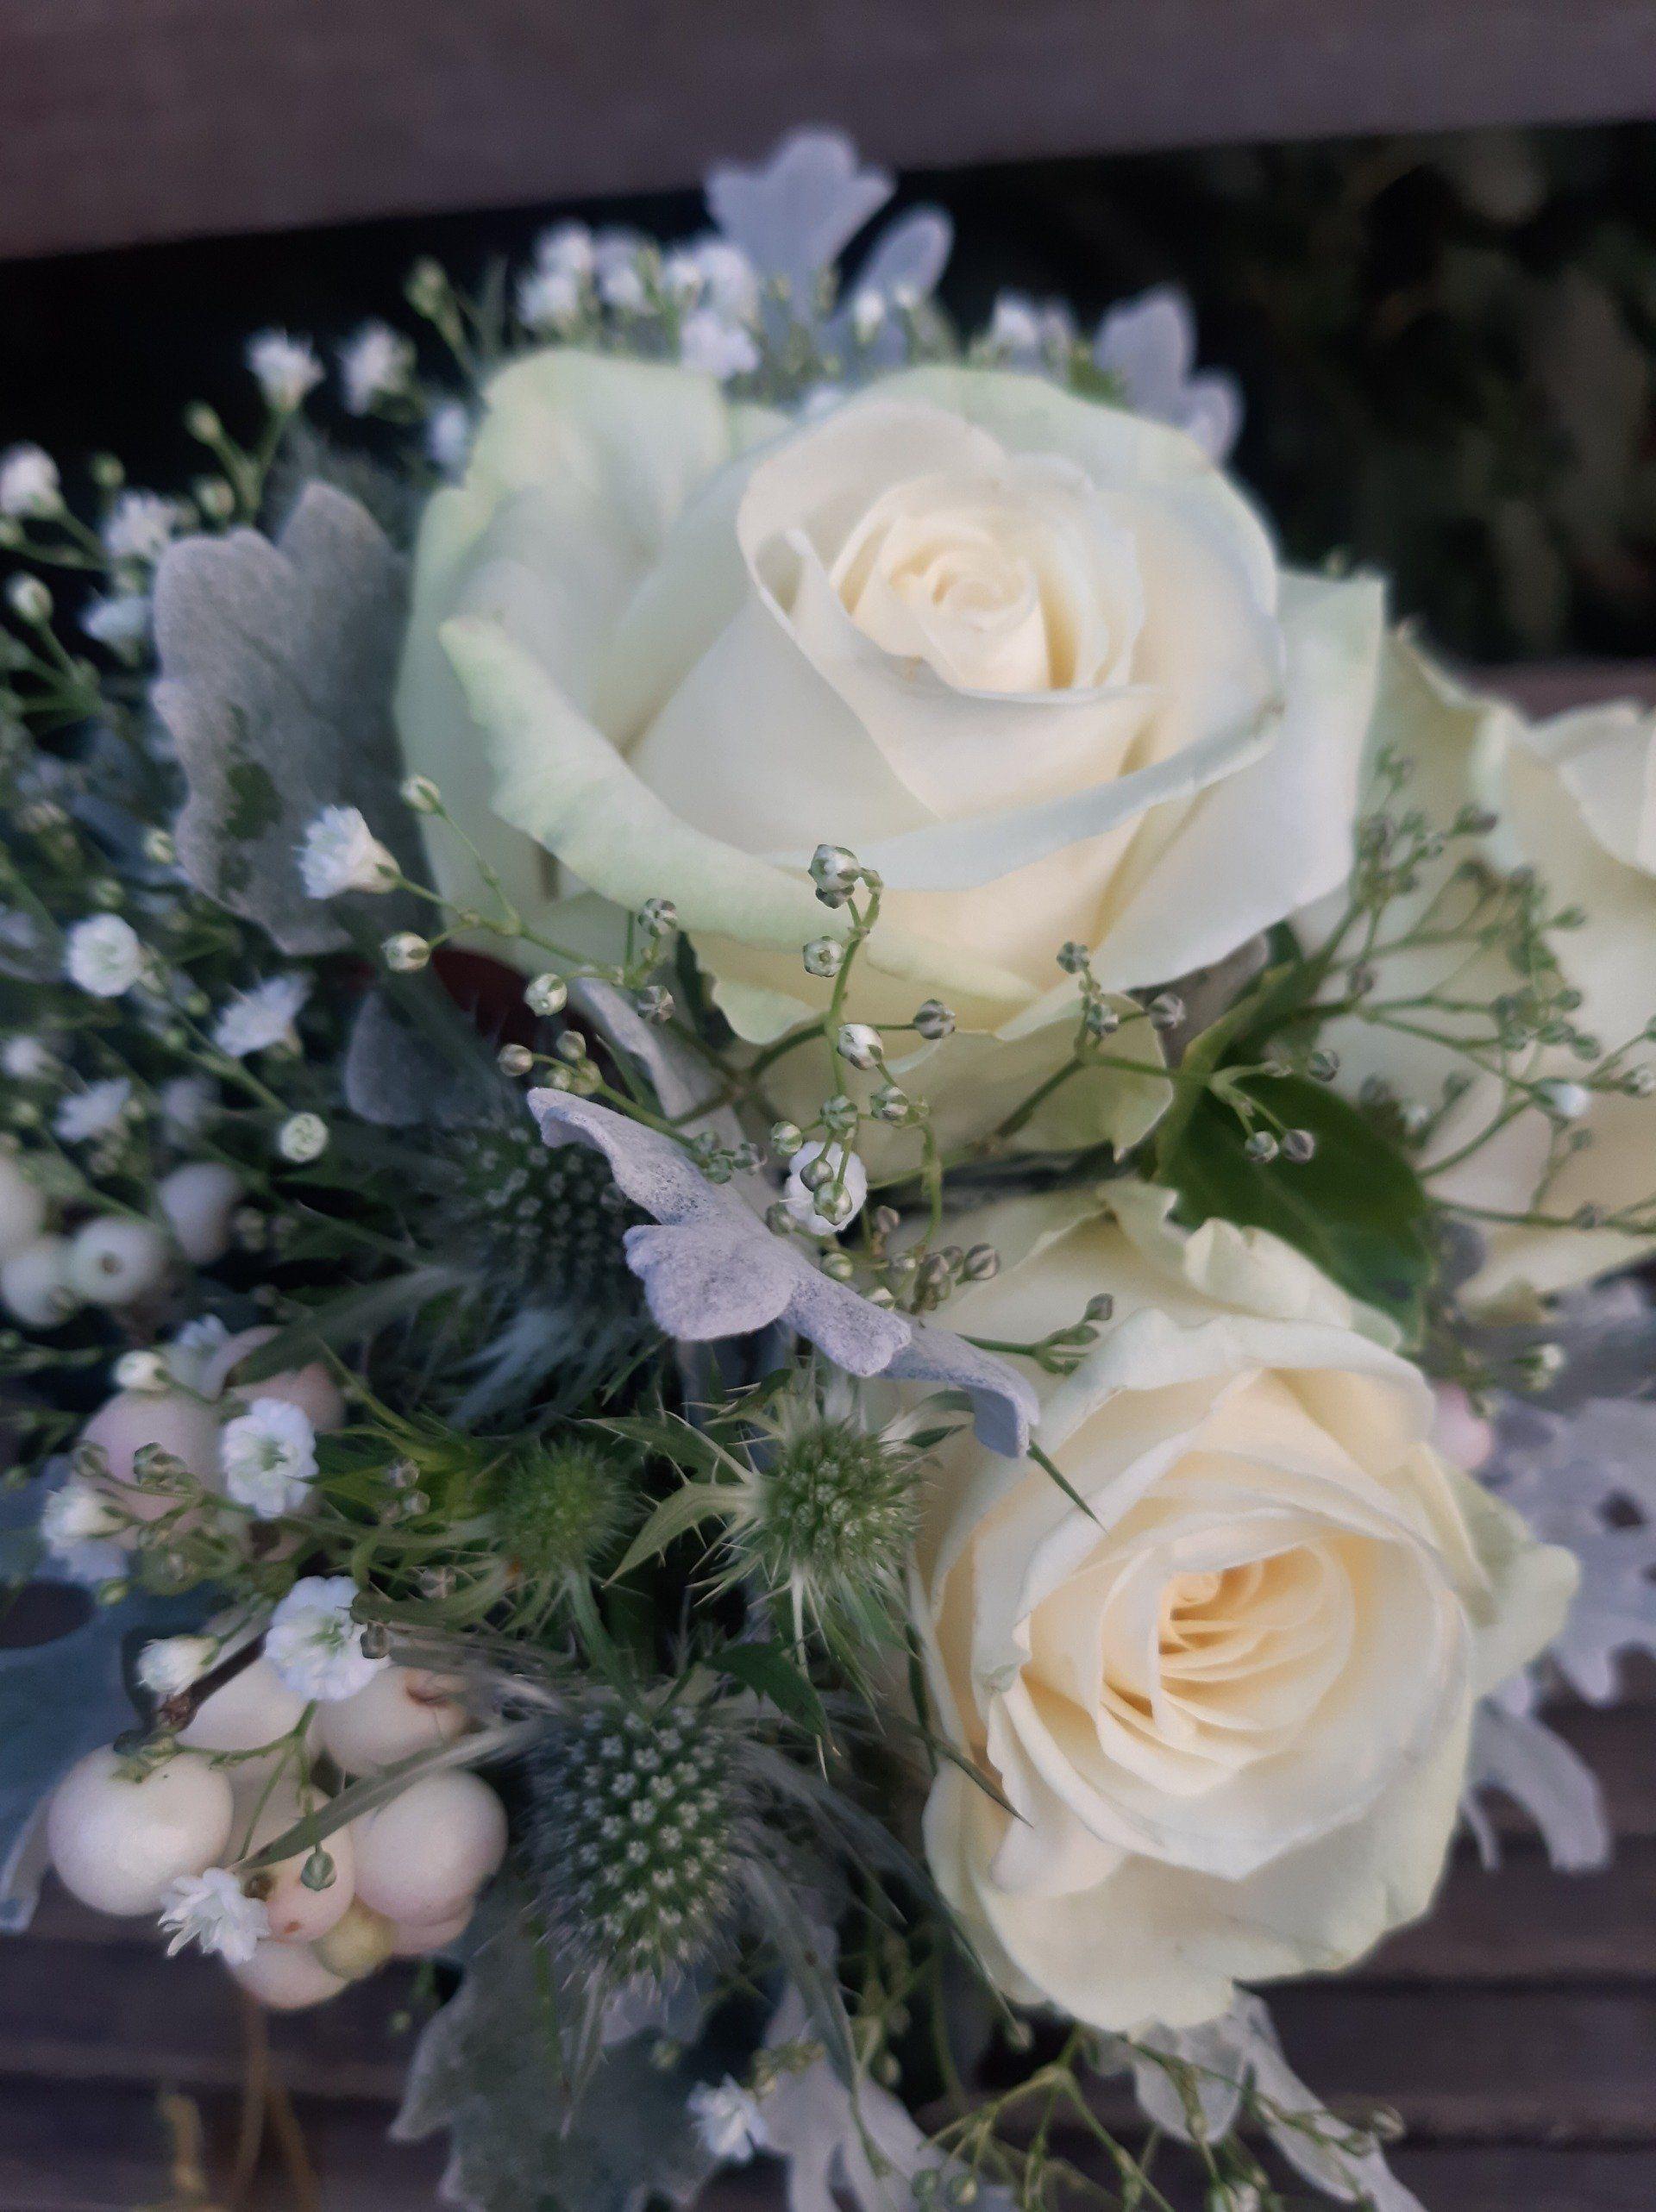 Moor Flowers Inh. Anja Behrens